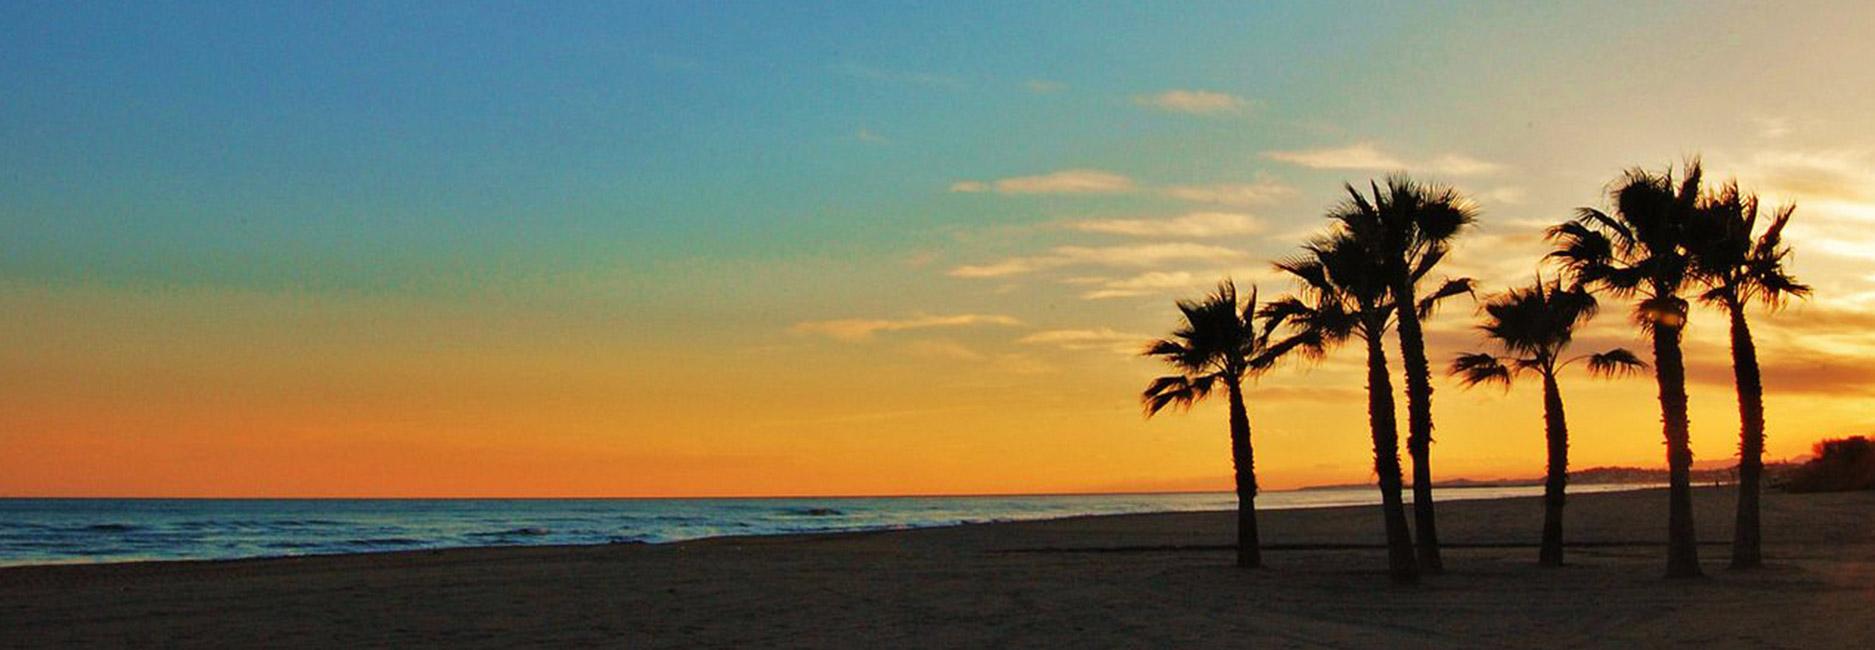 calaf_playa